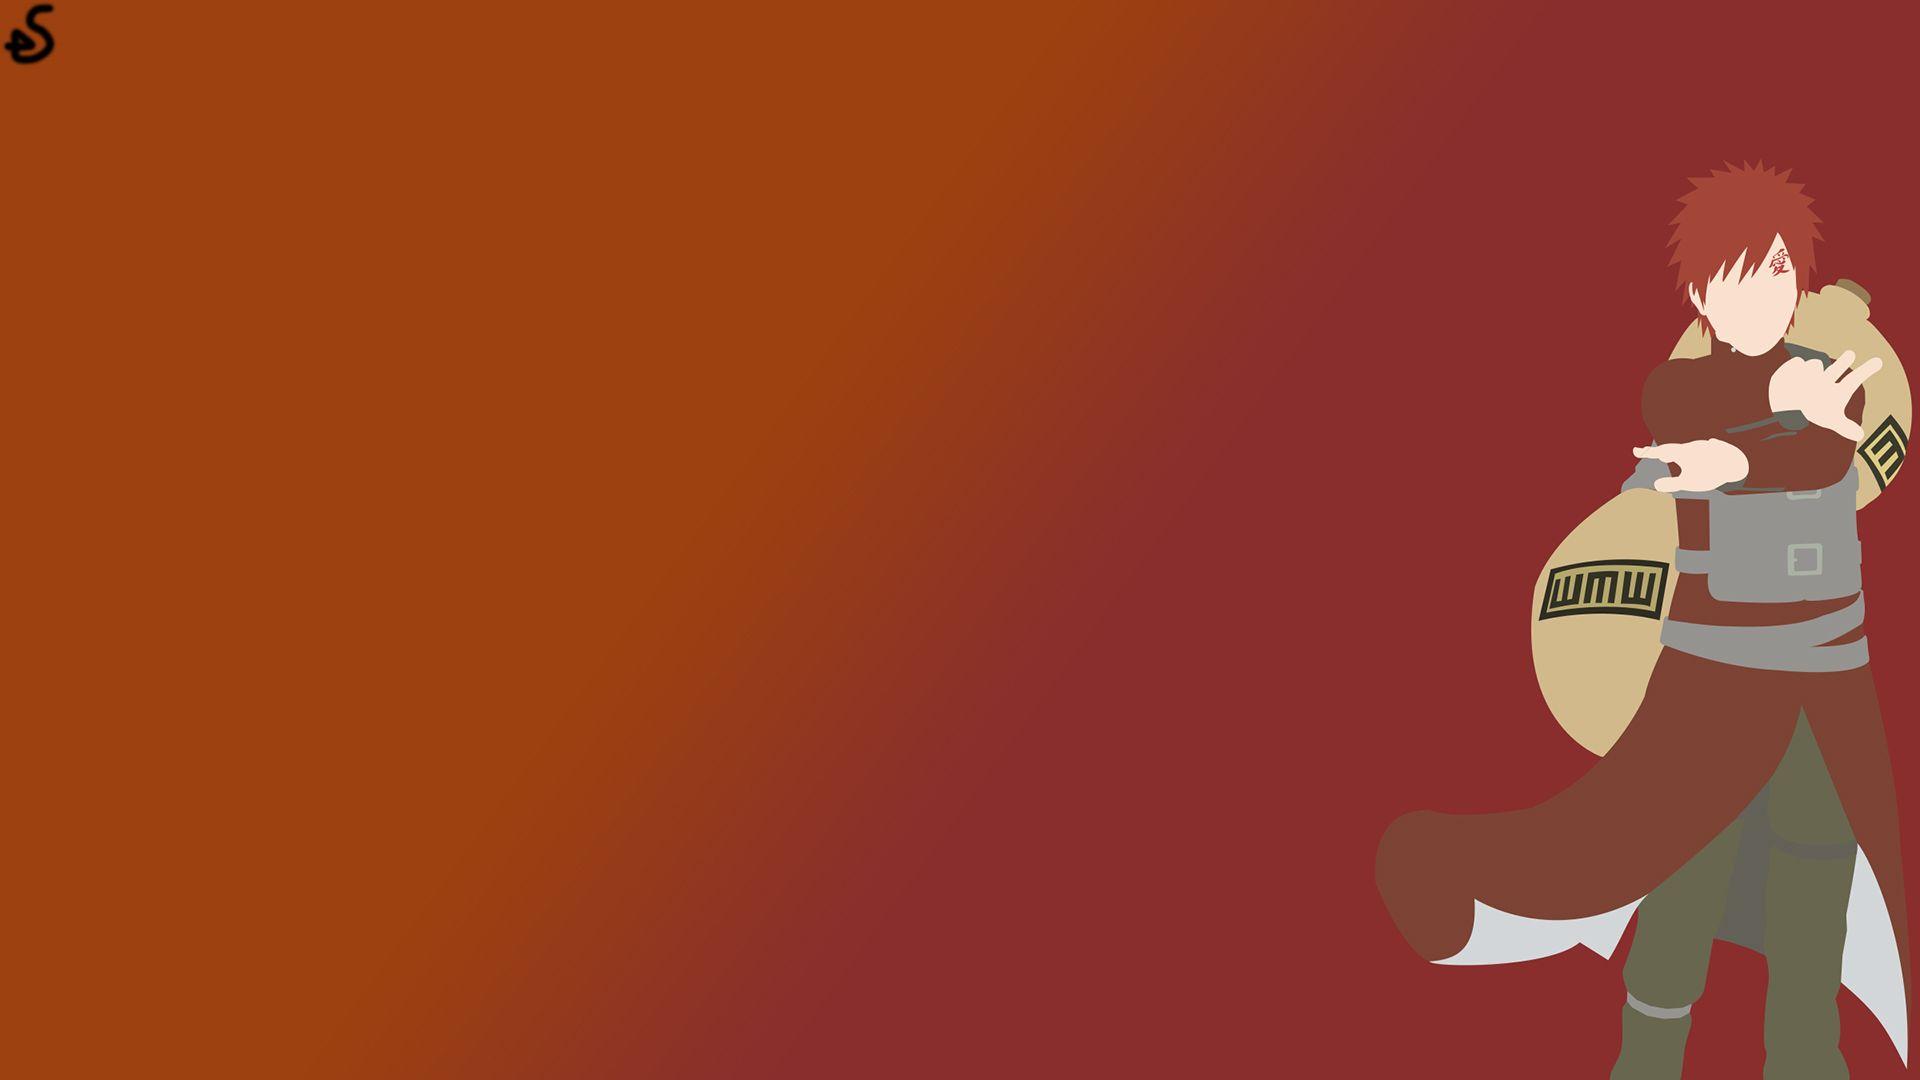 Good Wallpaper Naruto Minimalistic - 6224638629aed5beb0bd6f01ff7aa46c  Graphic_96772.jpg